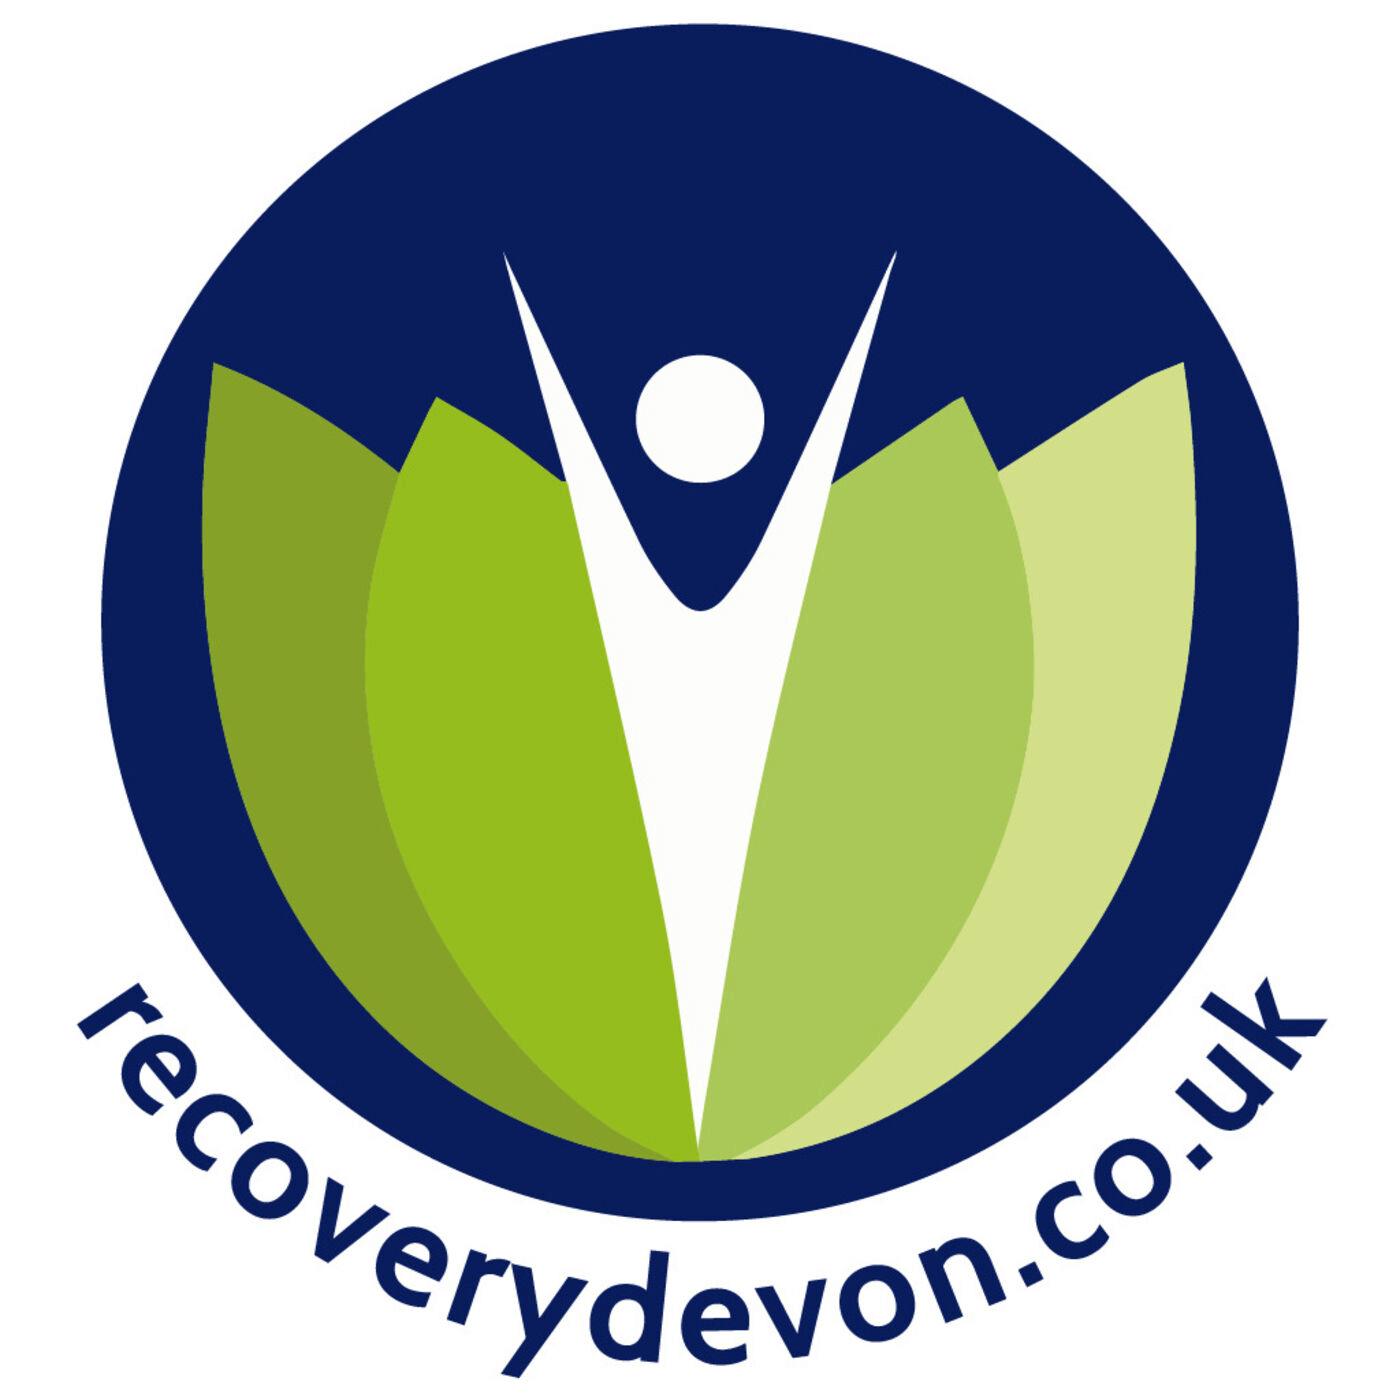 Recovery Devon